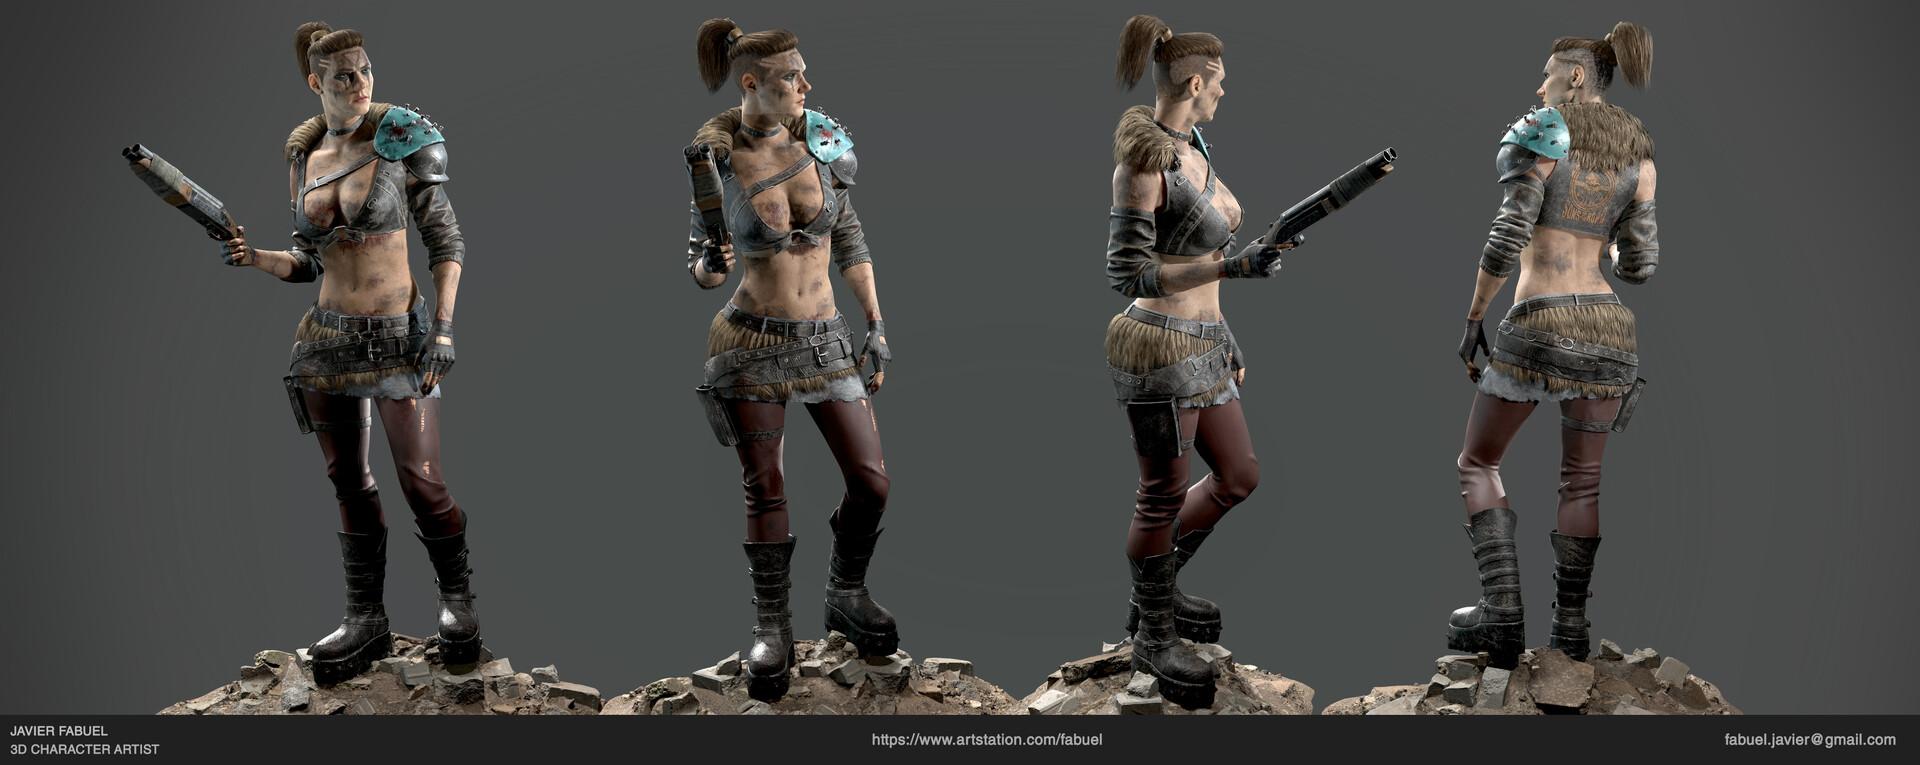 Personaje videojuegos